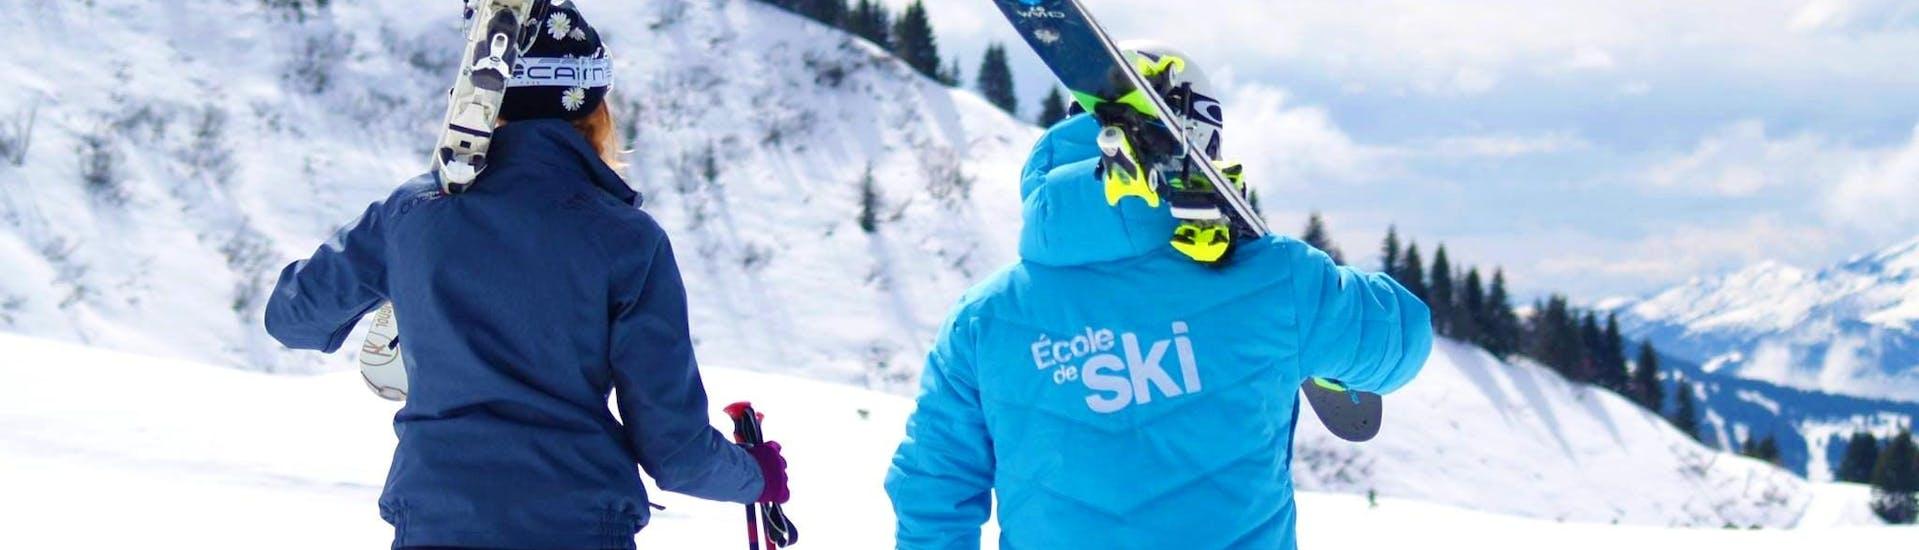 adult-ski-lessons-low-season-easy2ride-avoriaz-hero